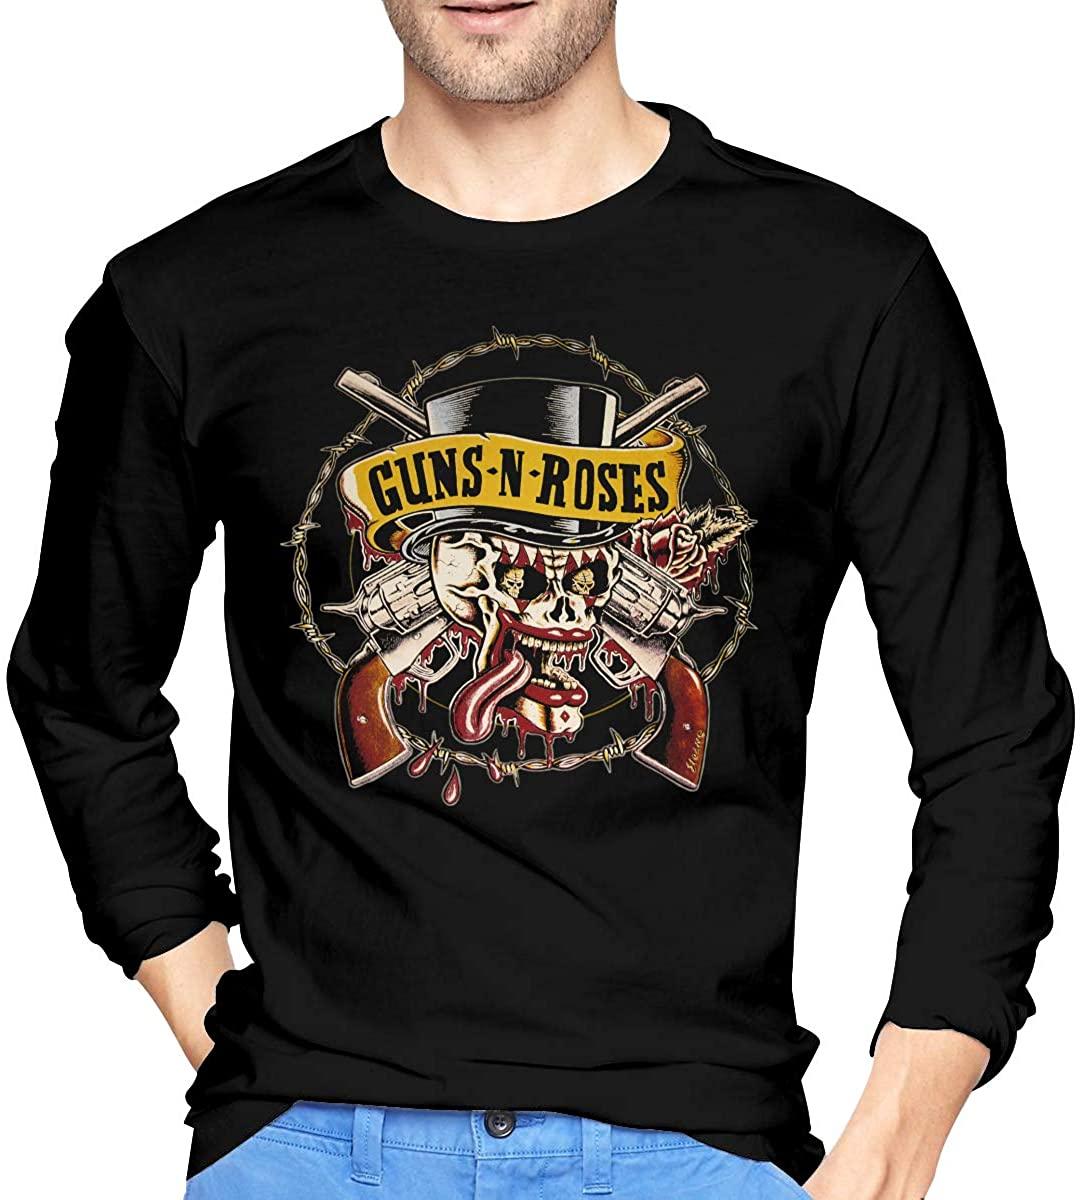 G-U-N-S N R-Os-E Men's Long Sleeve T-Shirts